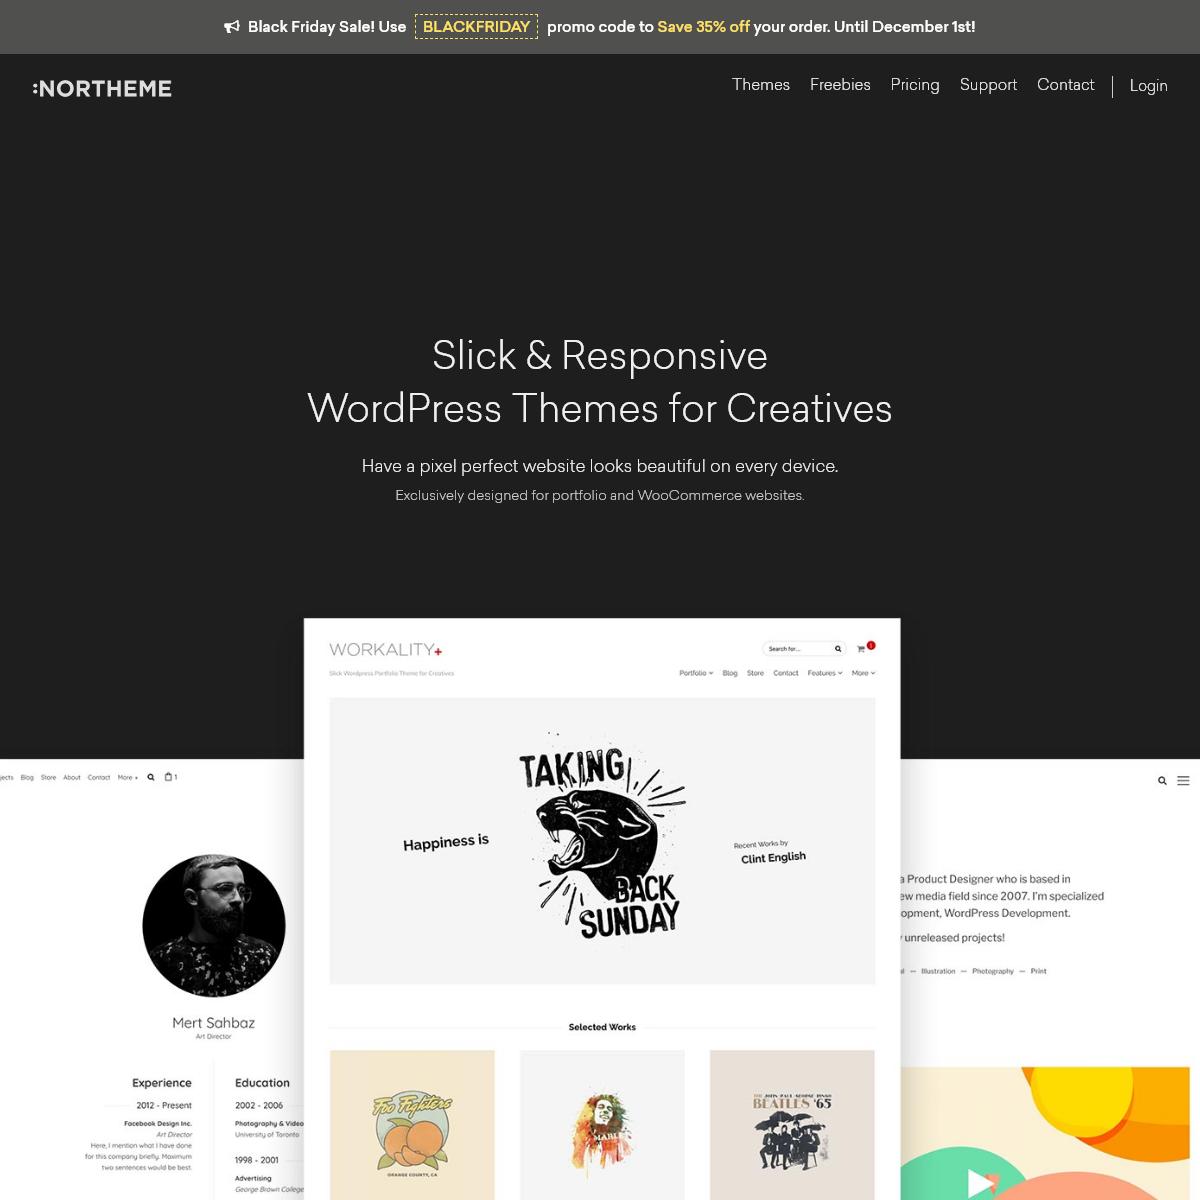 Slick & Responsive WordPress Themes for Creatives - Northeme